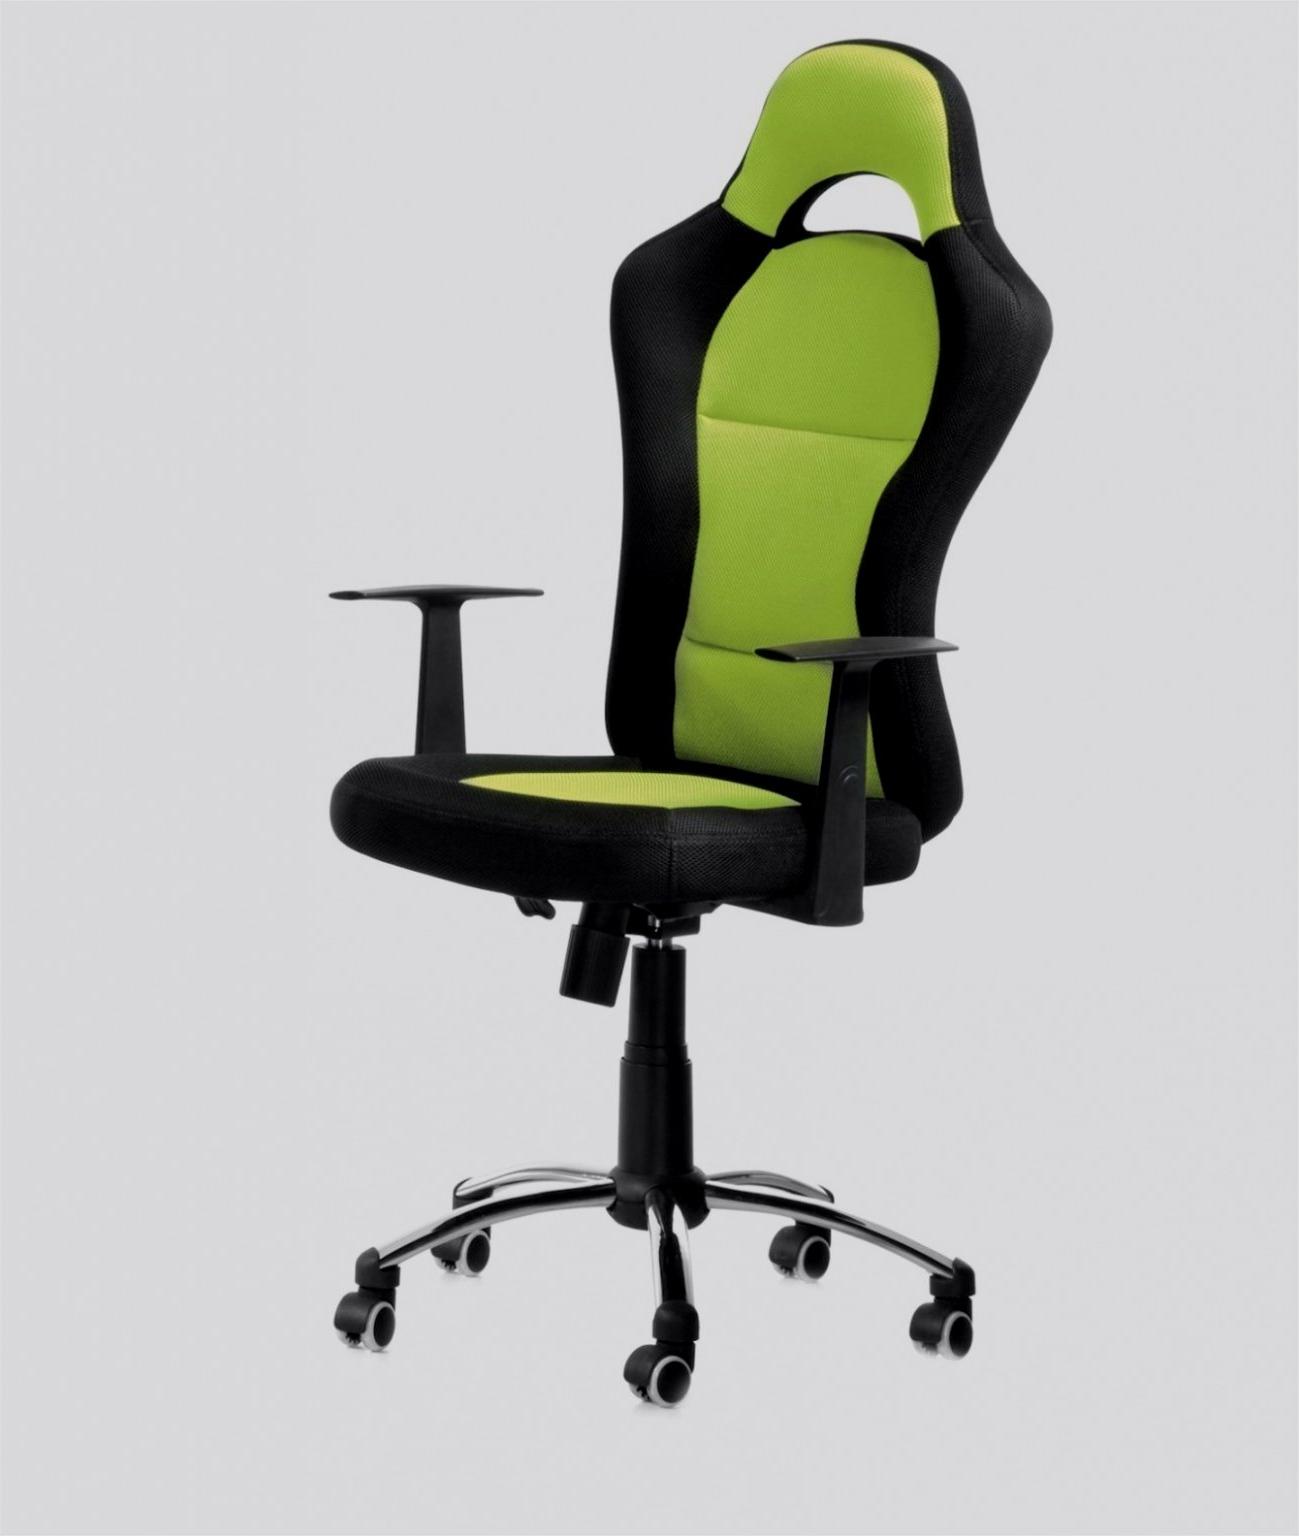 Oficina Inicio Silla Gaming Carrefour S1du Gamer Hermoso yYb6gIf7v